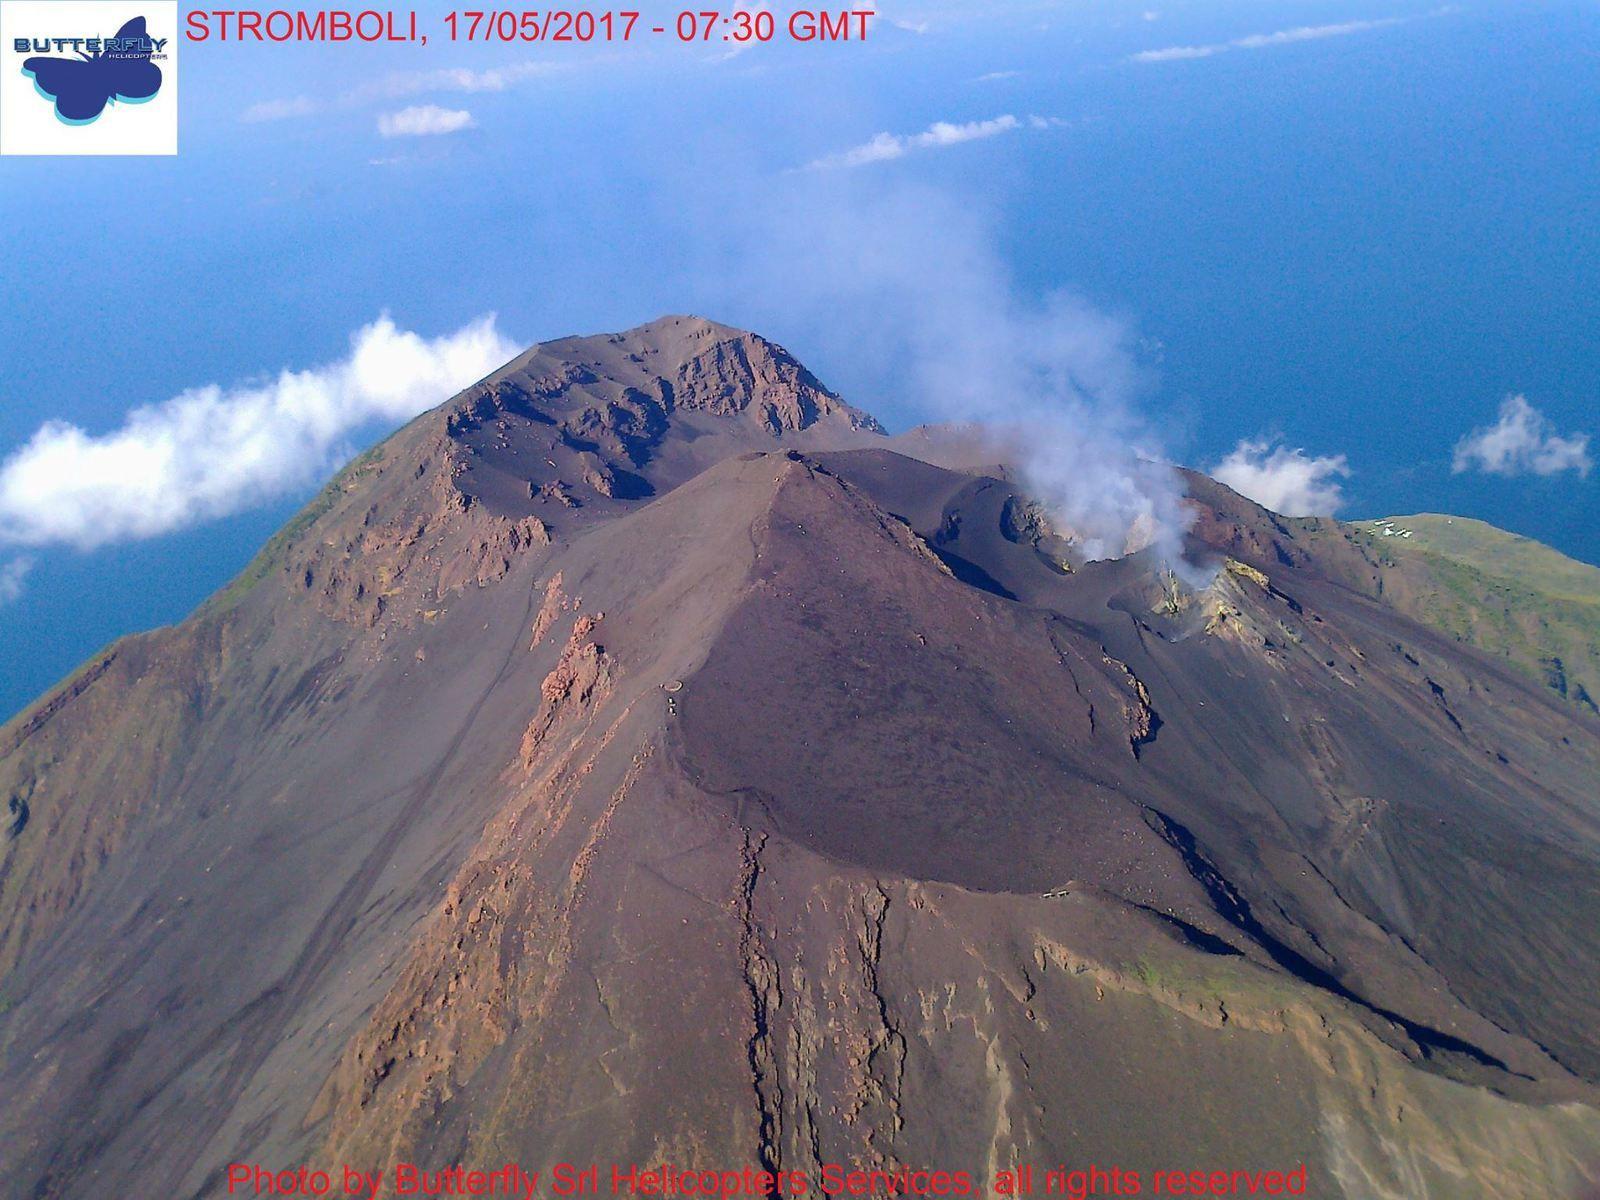 Stromboli - 17.05.2017 / 7h30 GMT - une belle vue des sommets par Butterfly helicopters Jos. Nasi